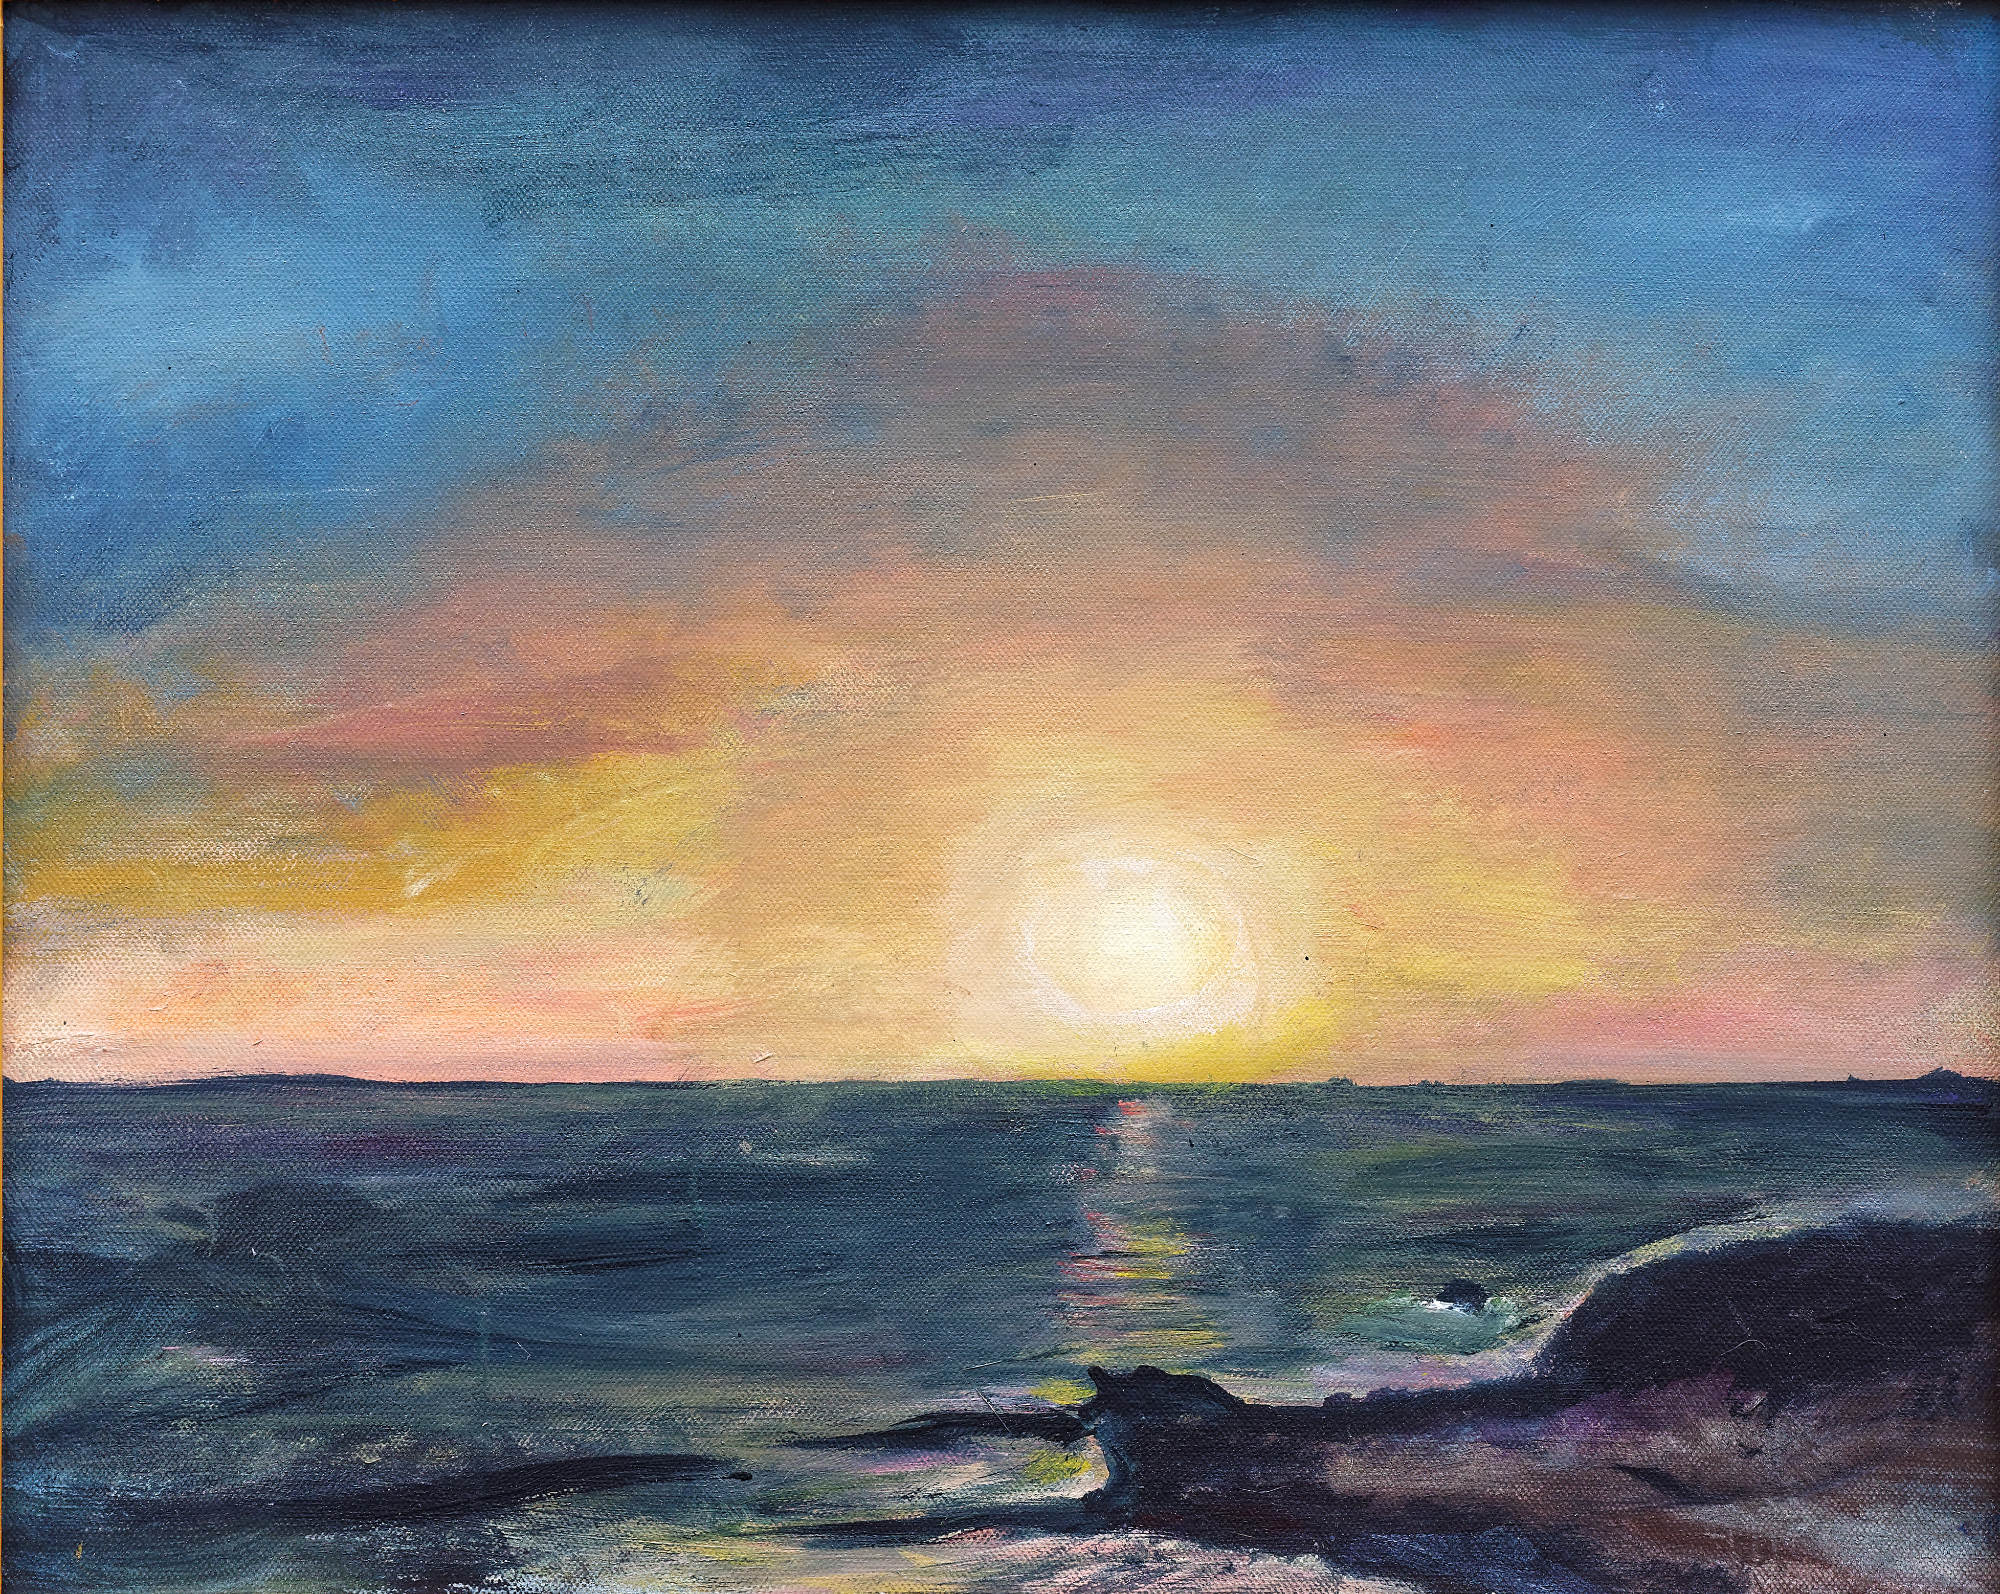 2014 - Sonnenuntergang Lanzarote - 50x40 cm, Acryl